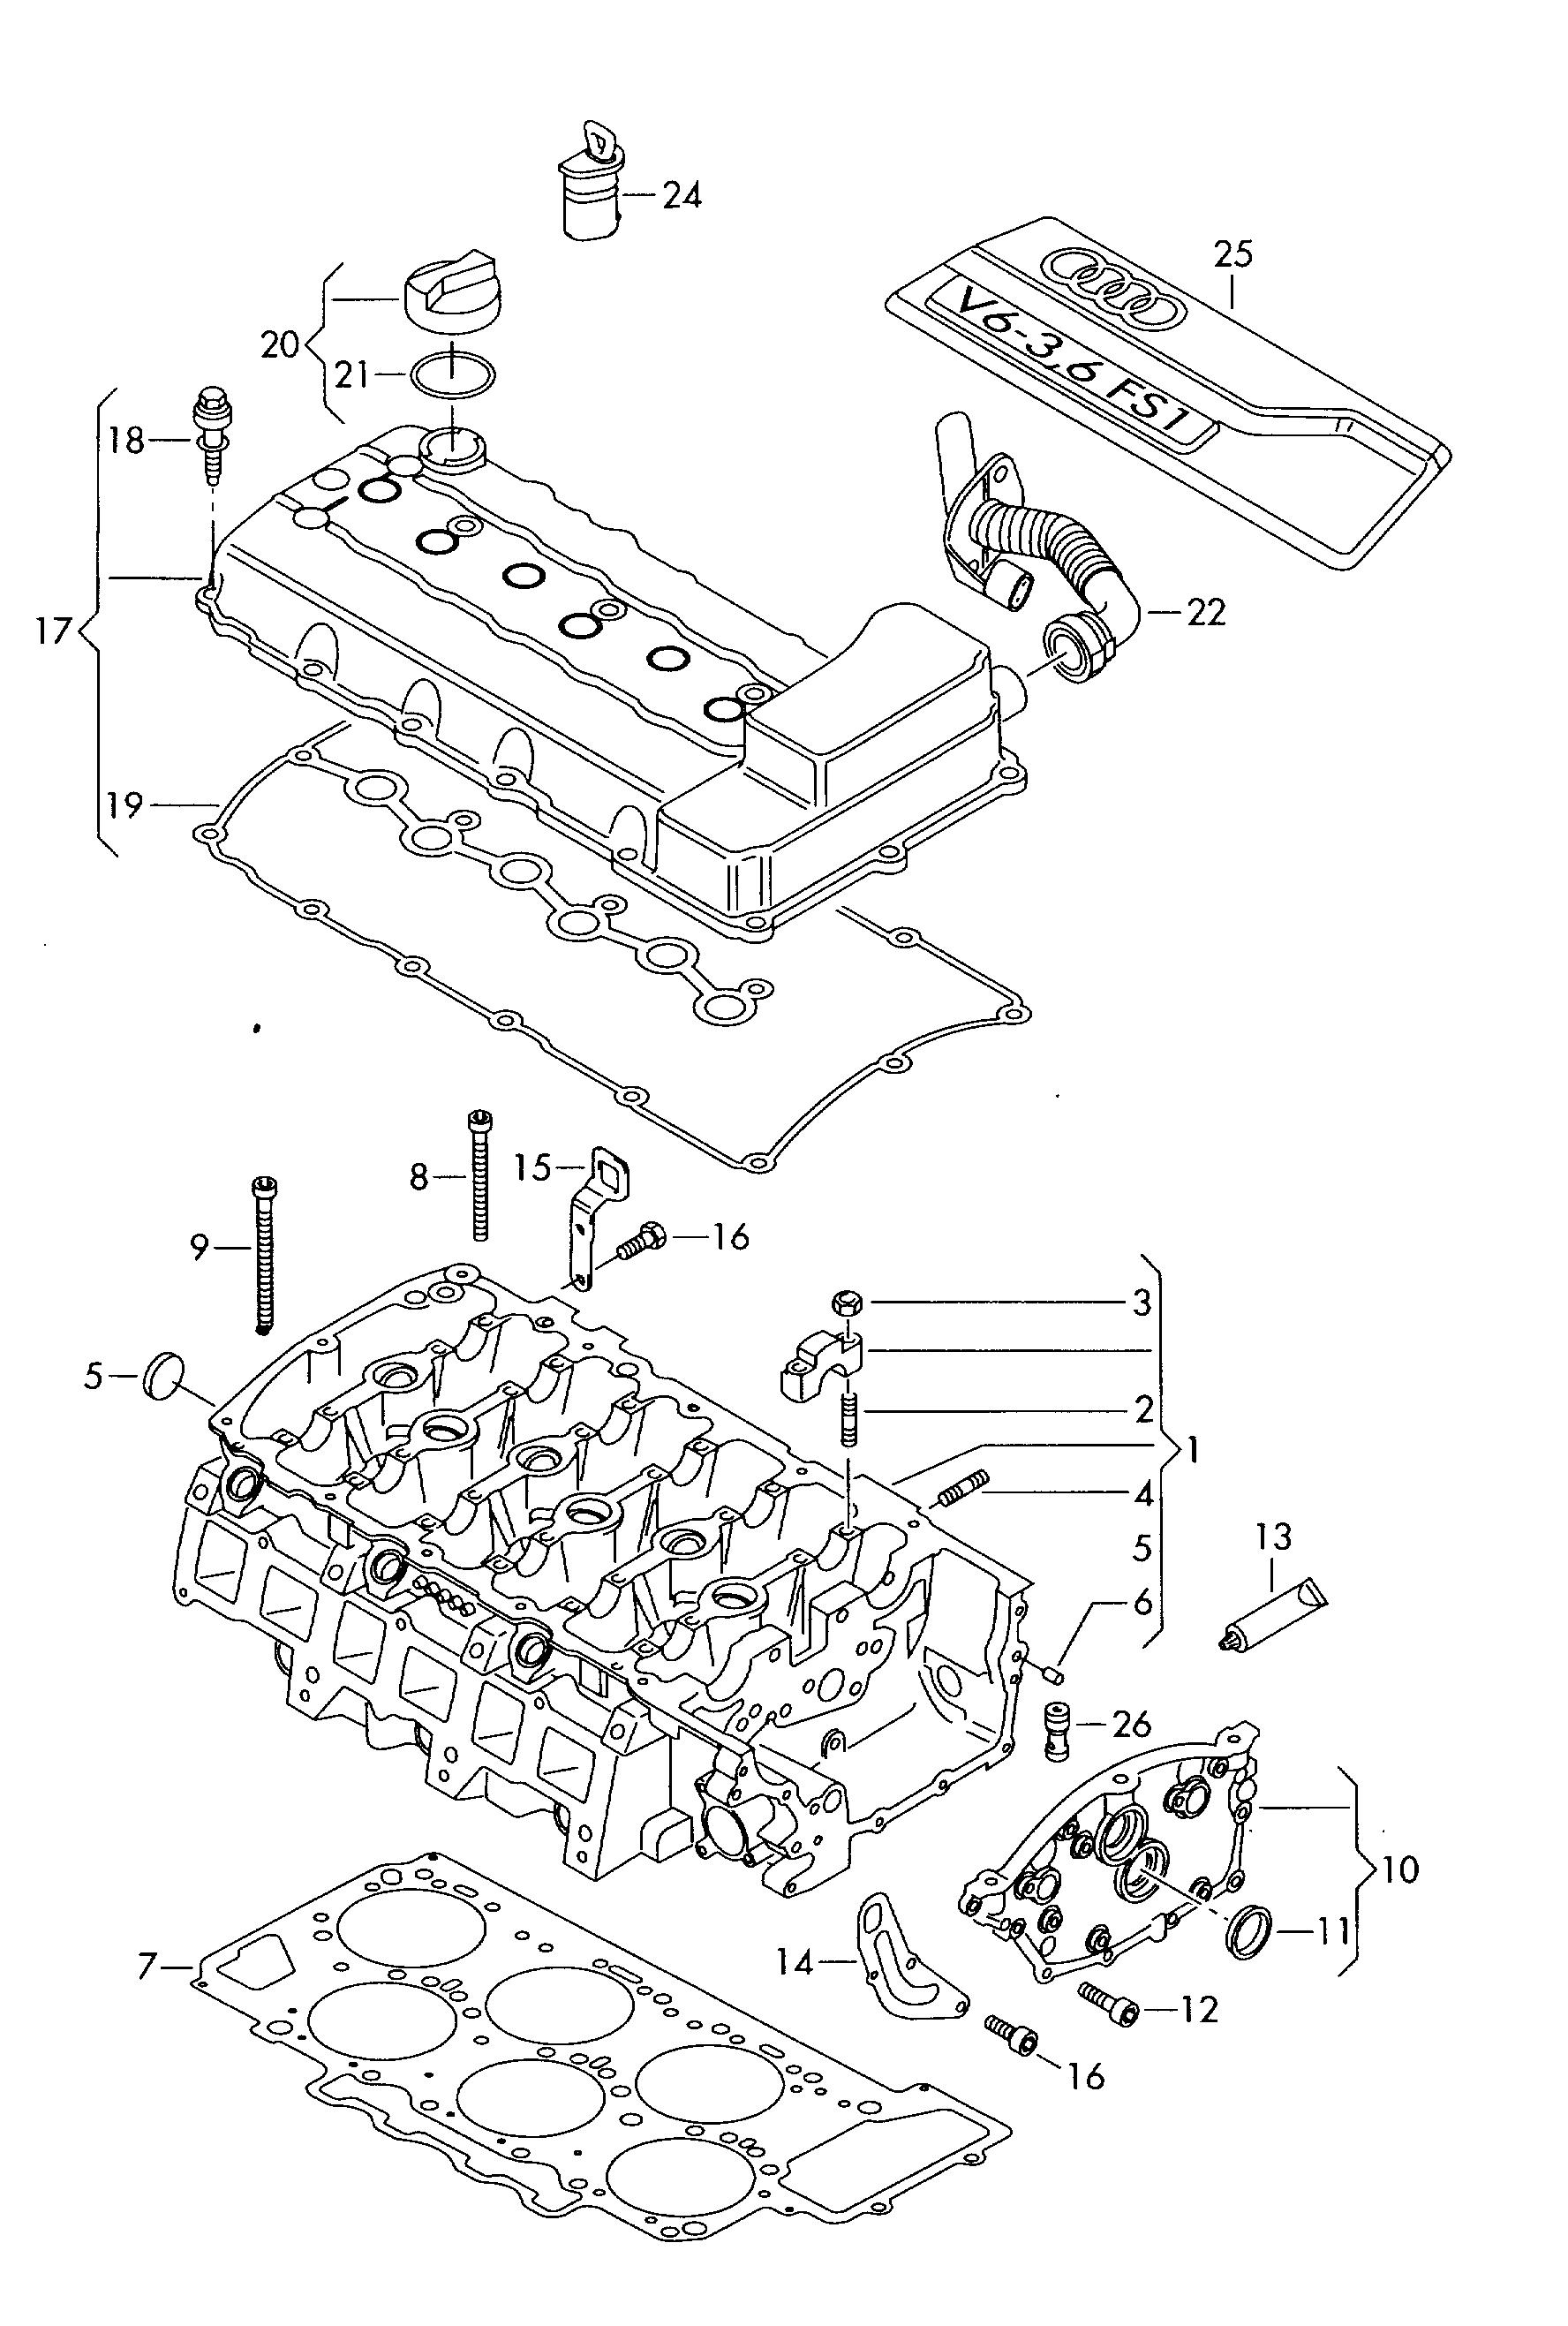 AUDI, Audi Q7 USA, 2007, Engine, 10325 - Catcar.infoCATCAR.INFO